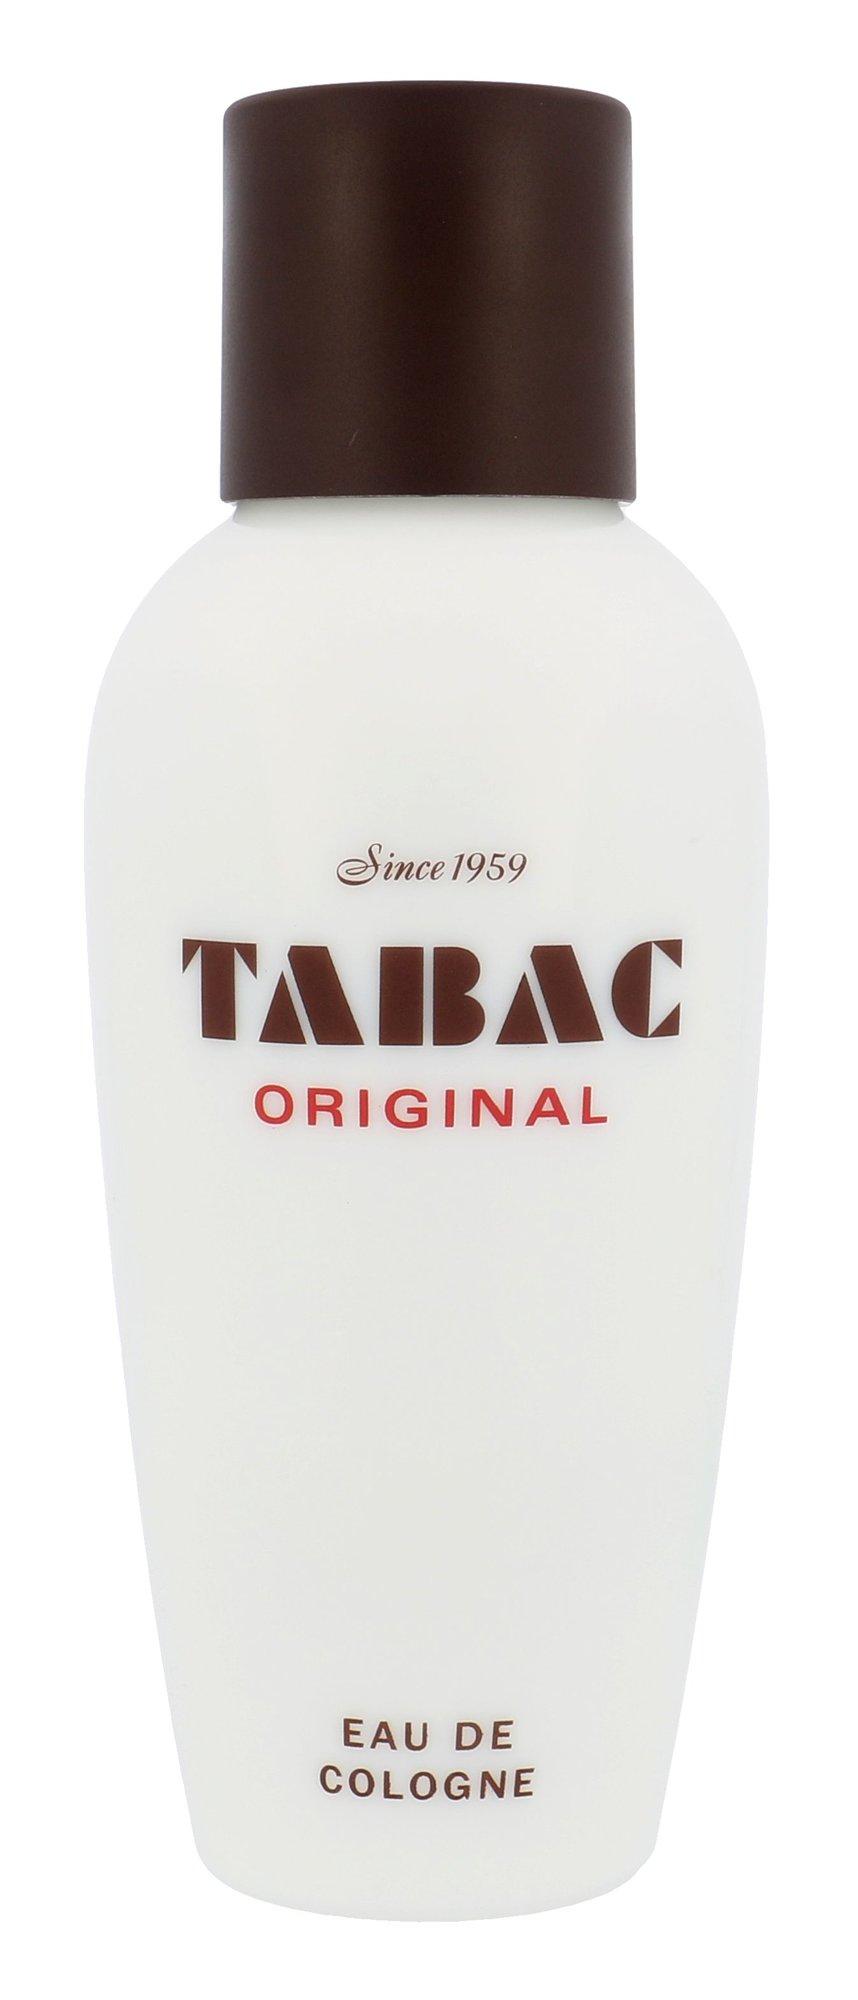 TABAC Original Cologne 300ml